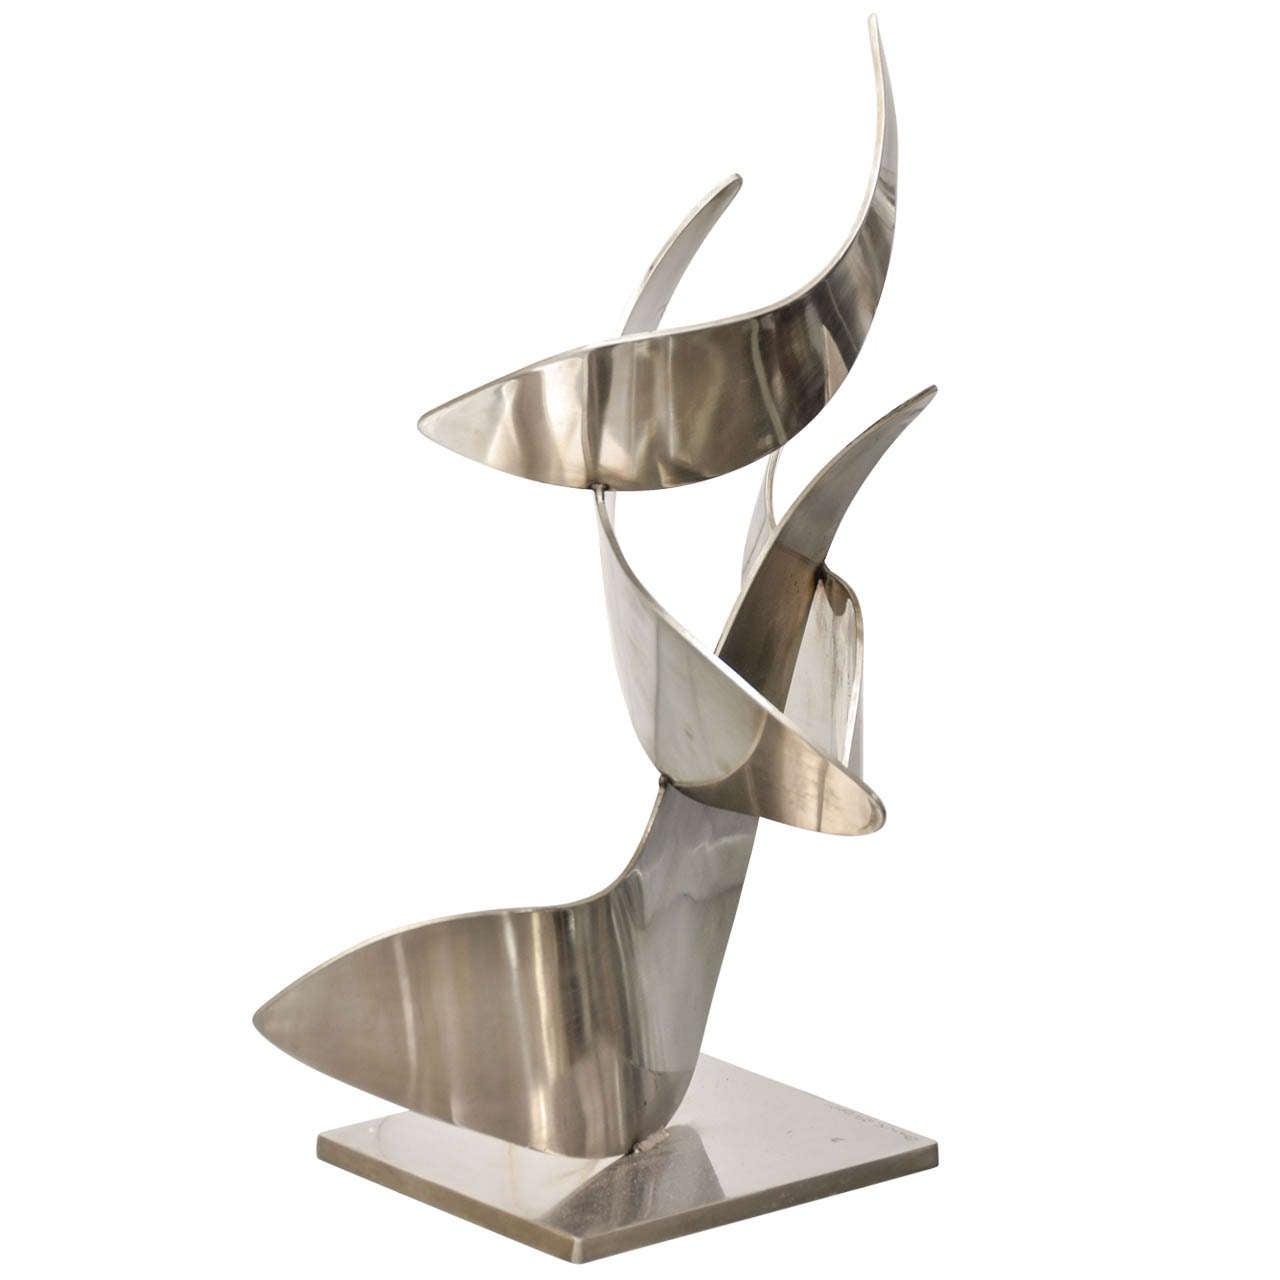 Harry bertoia furniture - Stainless Steel Sculpture At 1stdibs